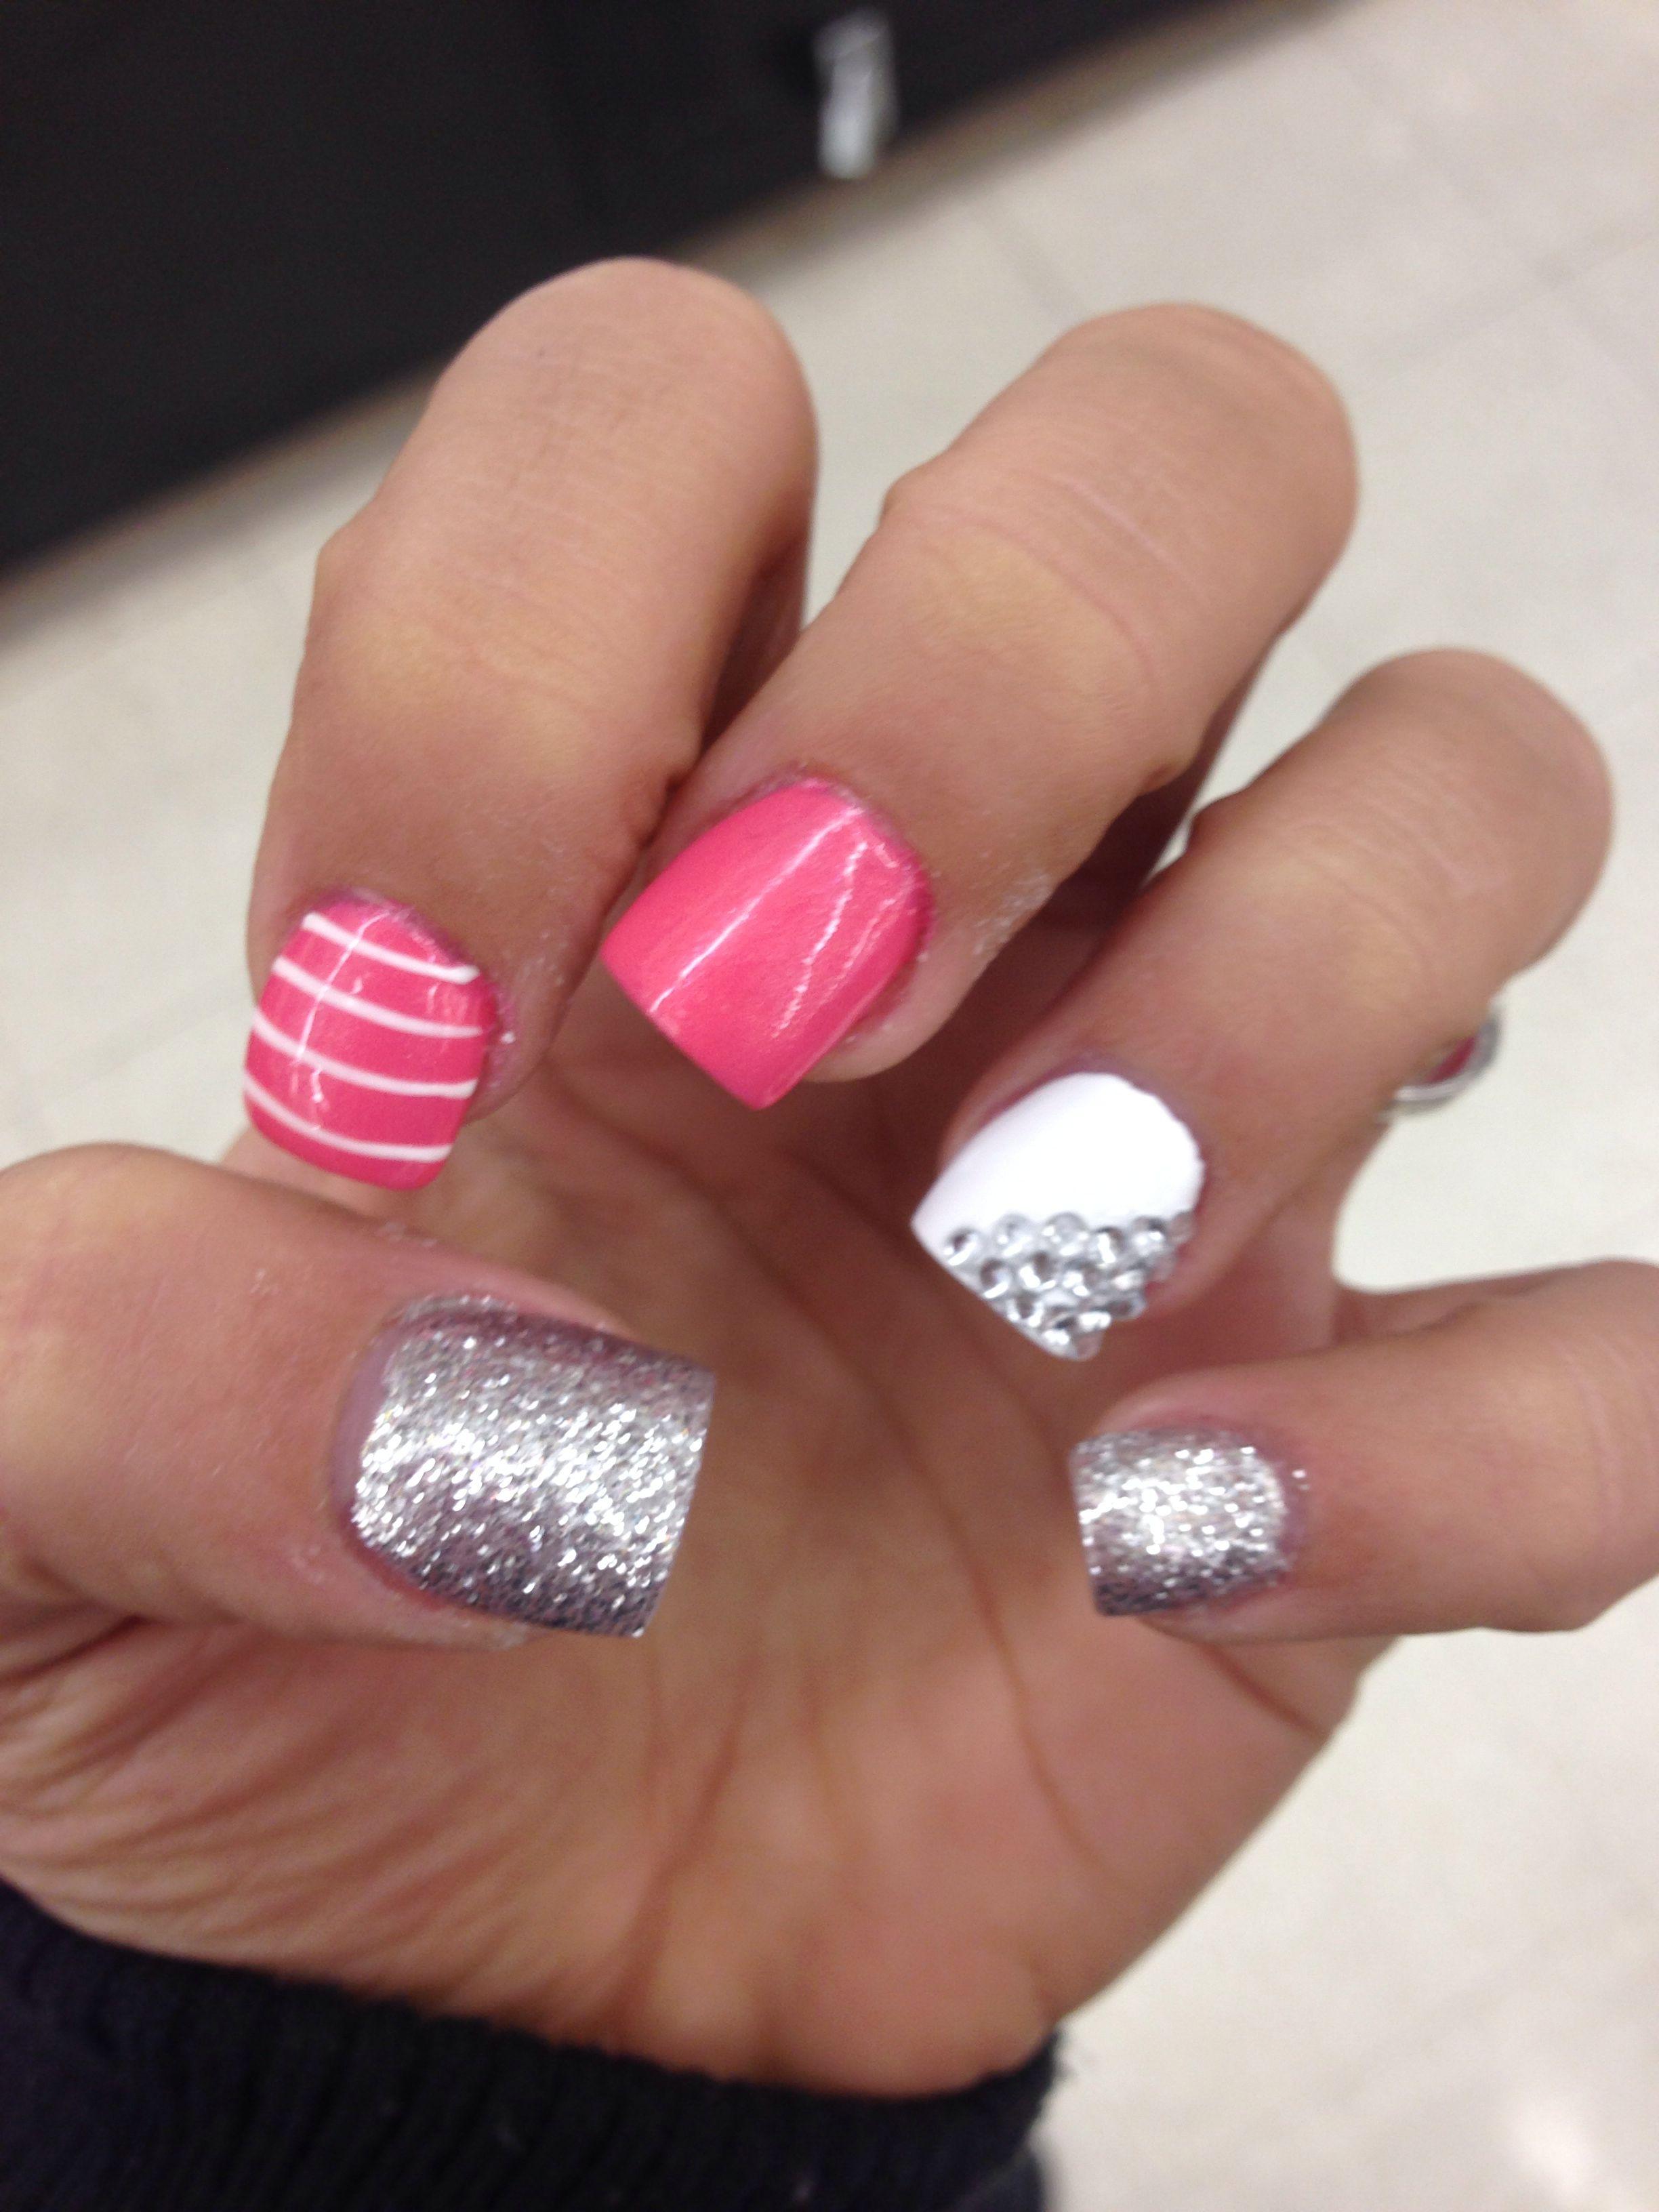 Formal nails nails pinterest formal nails pink and stripes